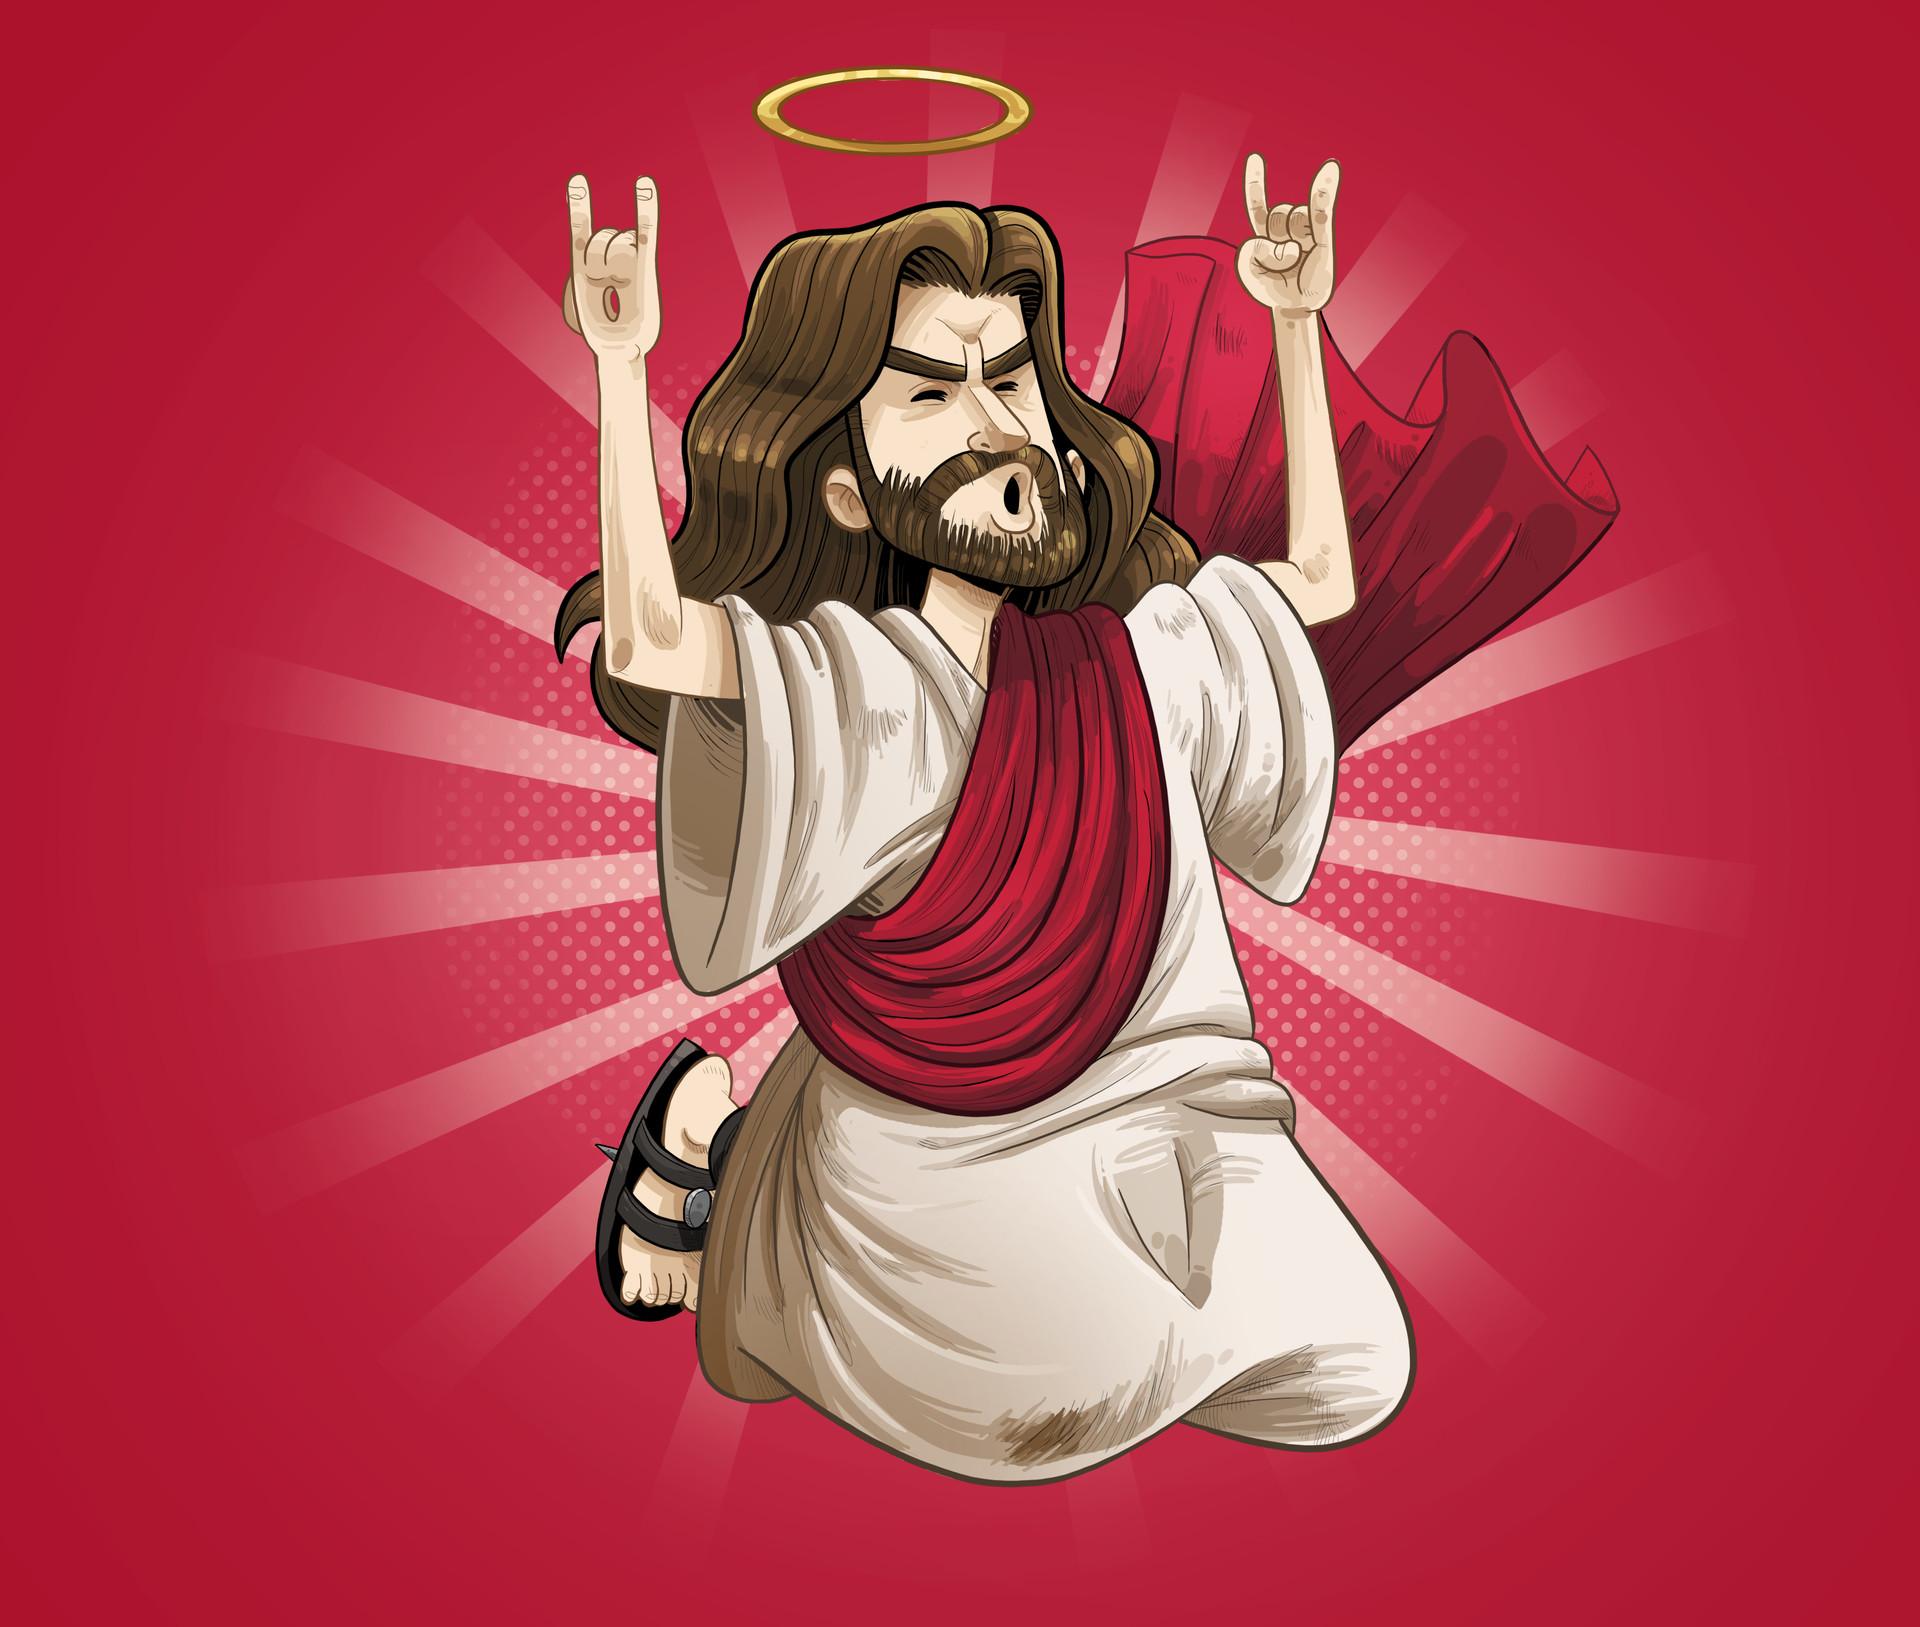 Gabirotcho jesus manero rock